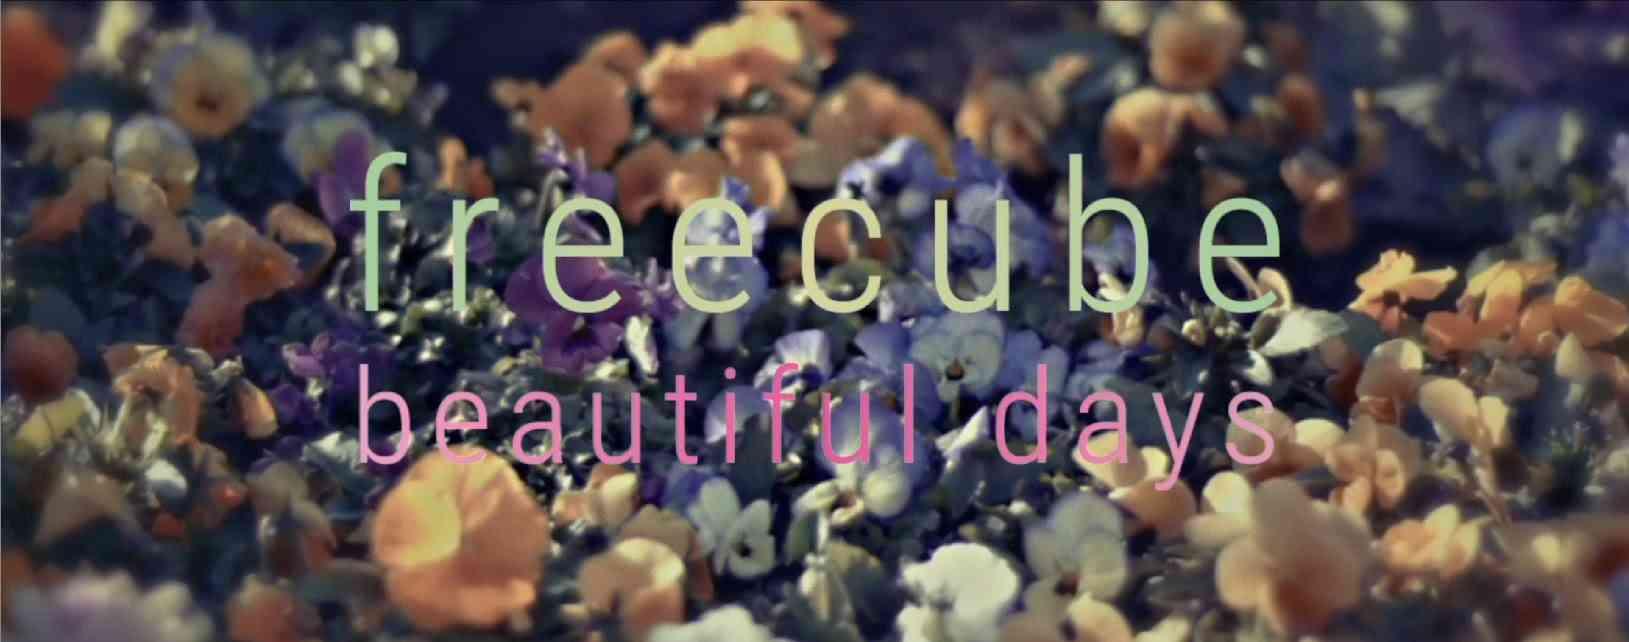 freecube / beautiful days(radio edit) - YouTube